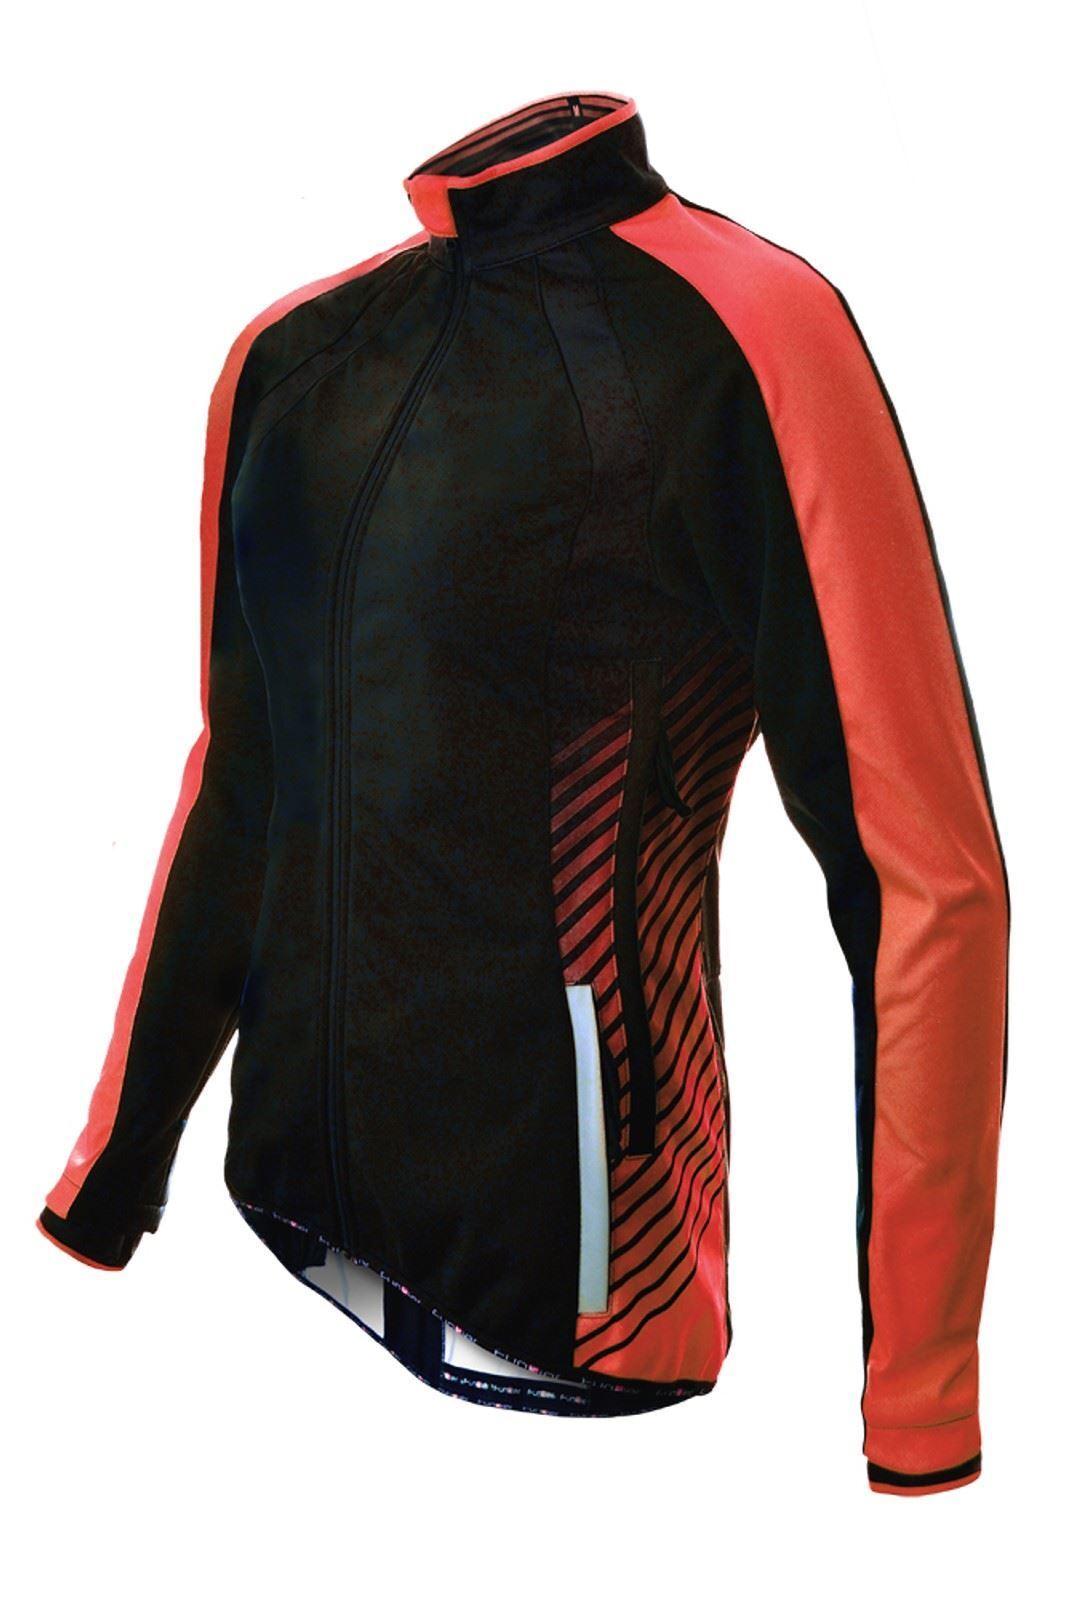 Chaqueta Ciclismo Funkier Tacona WJ-1324  Mujer Windstopper Negro Rojo Xs  mejor oferta